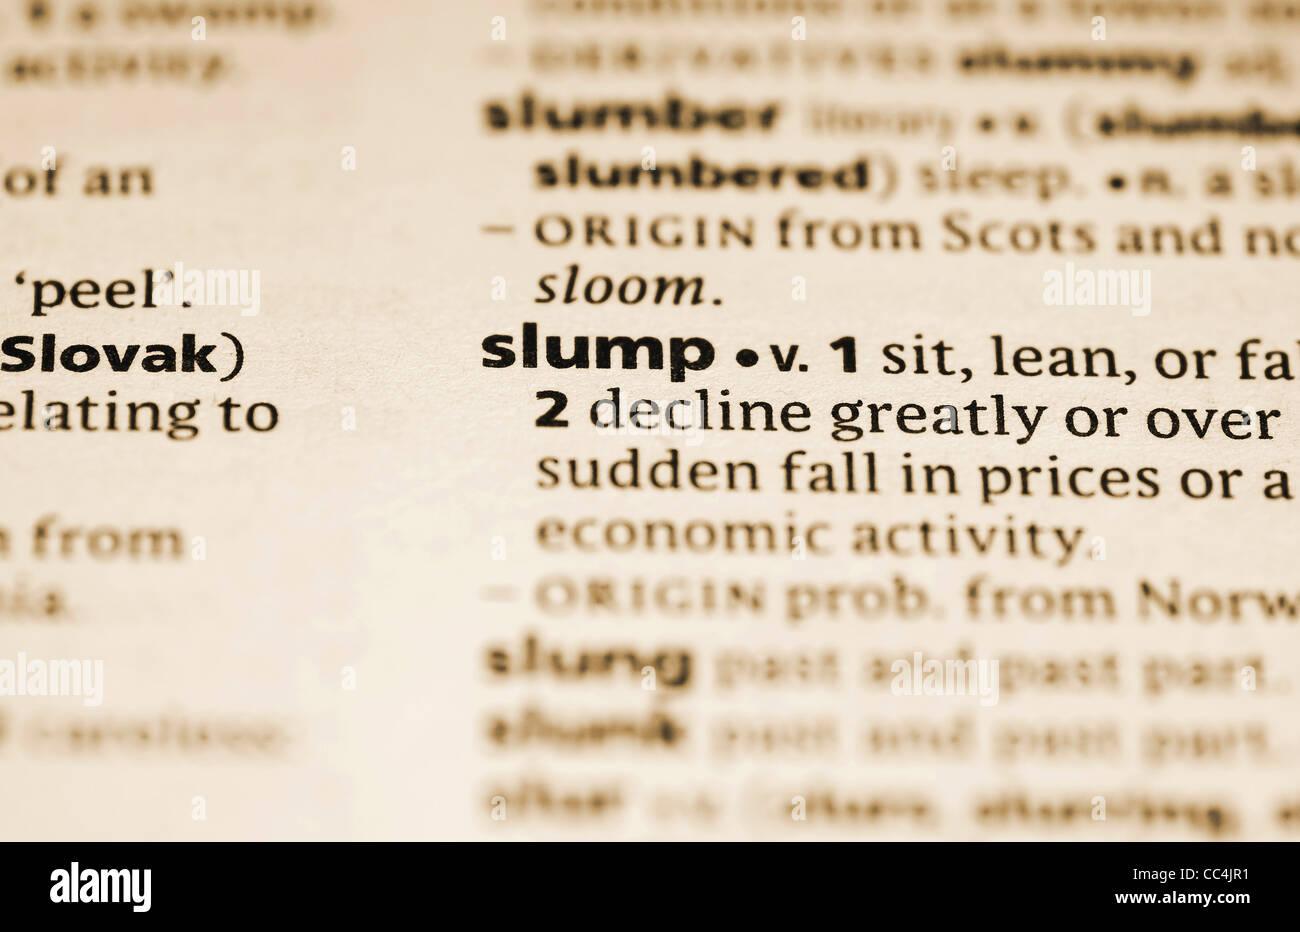 Financial slump - Stock Image